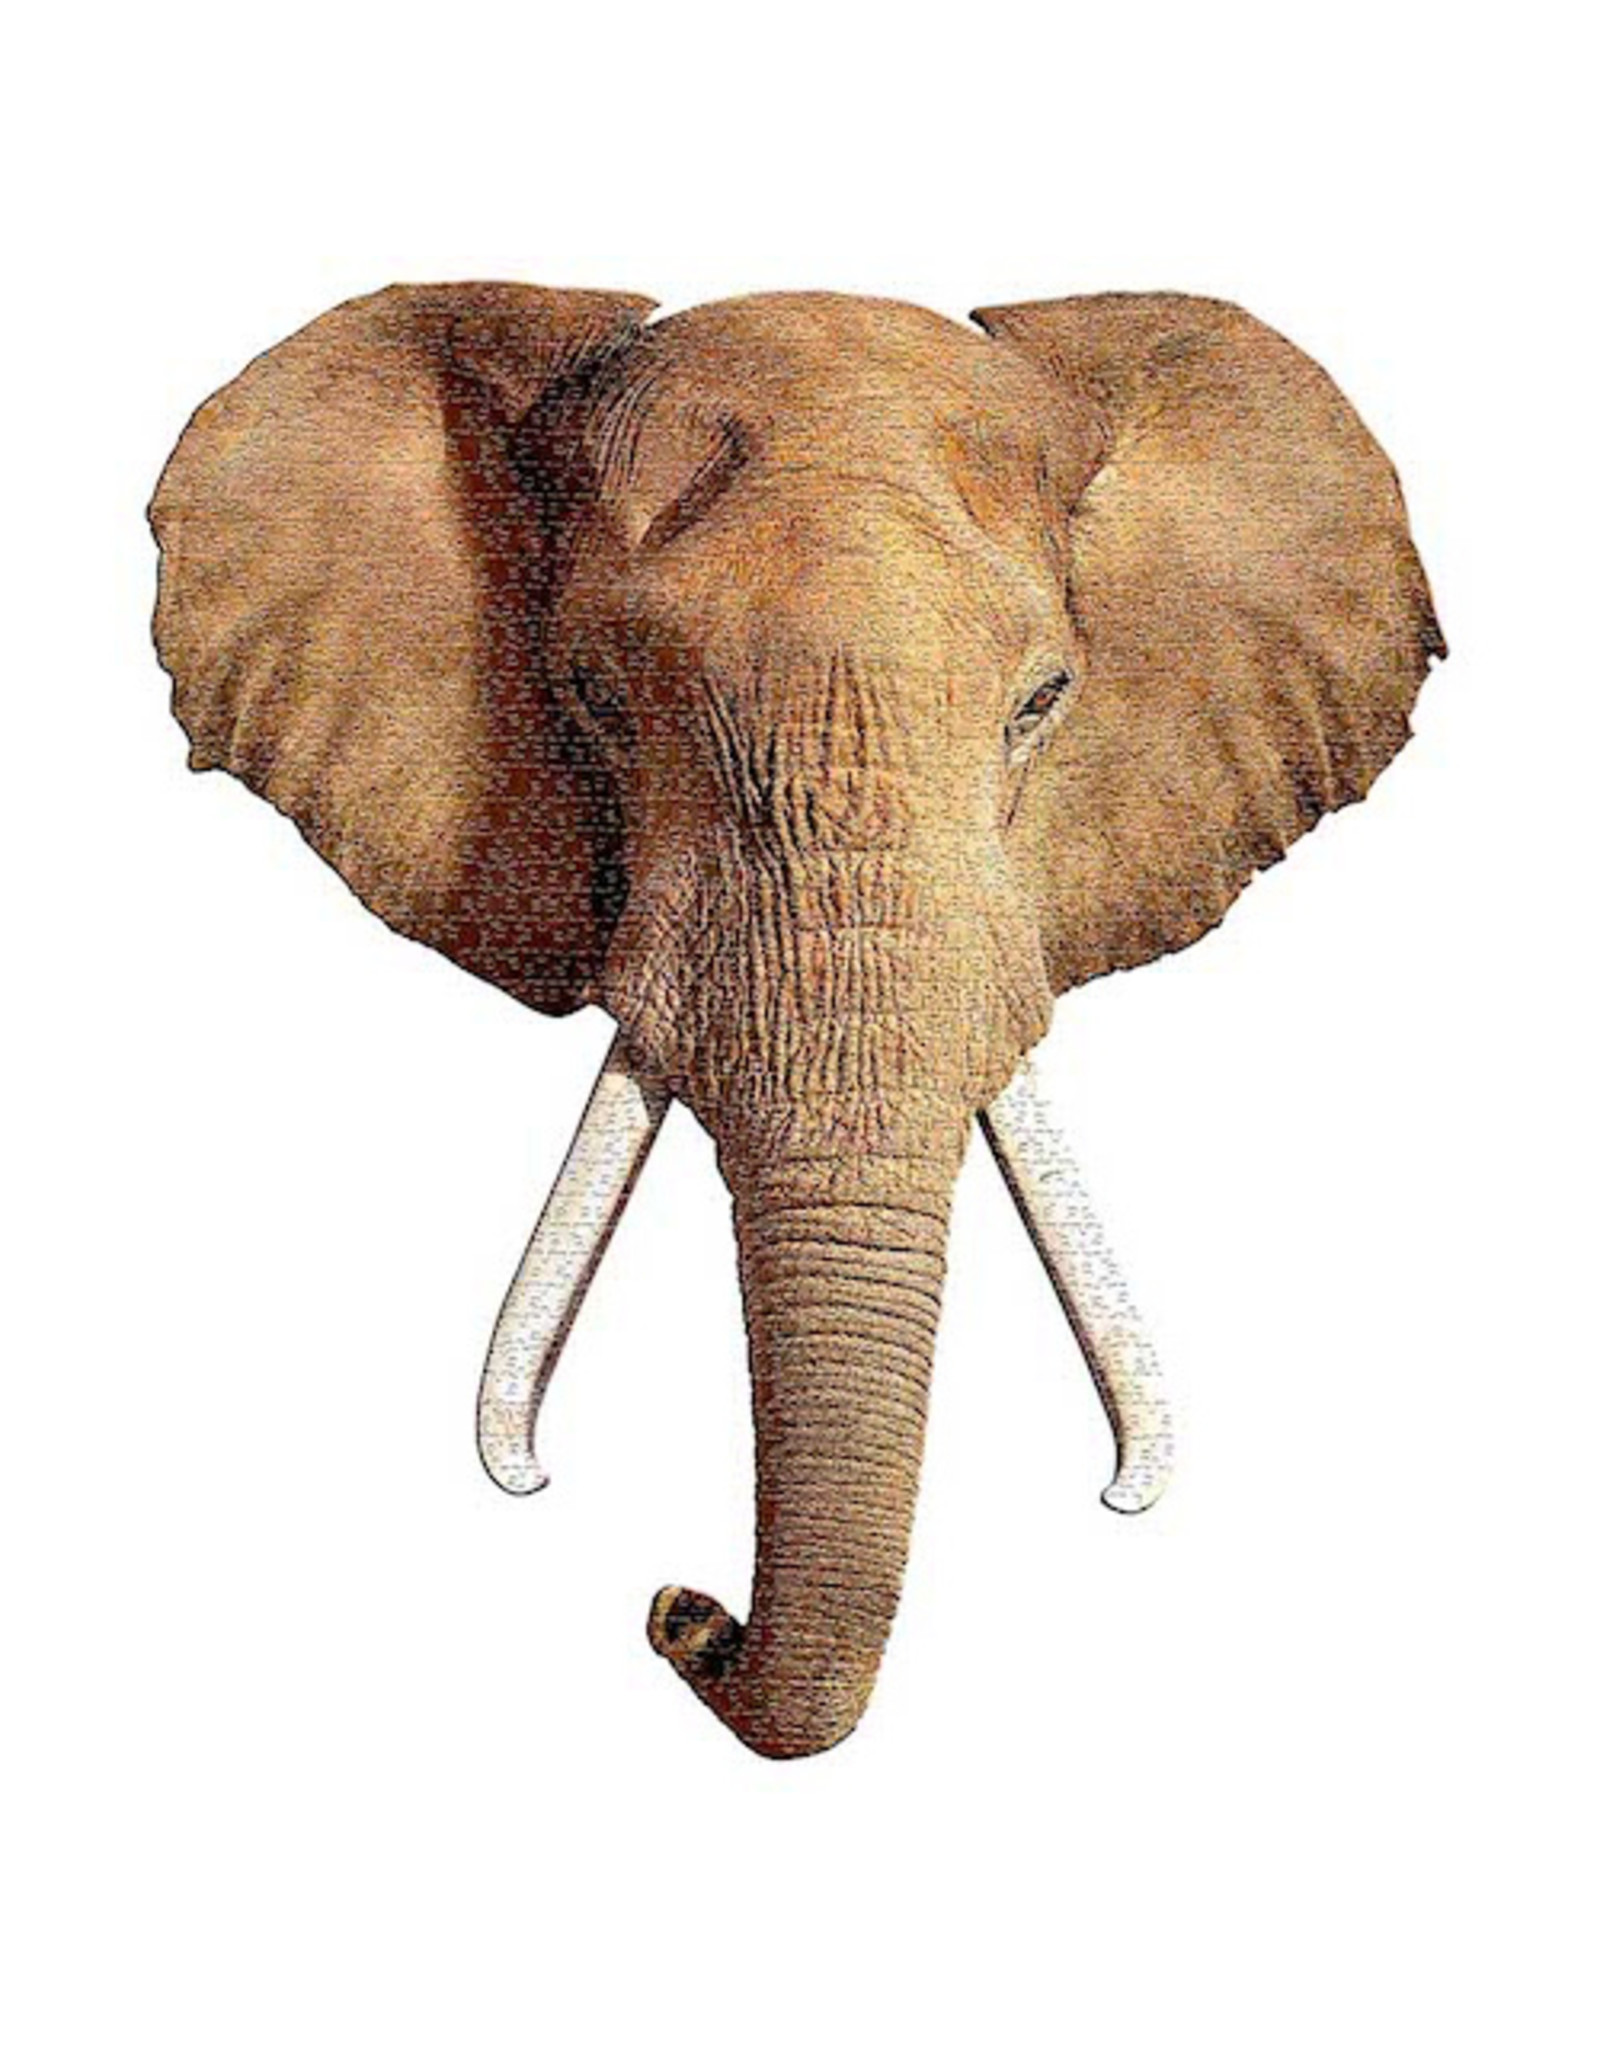 Madd Capp Puzzle - I AM Elephant